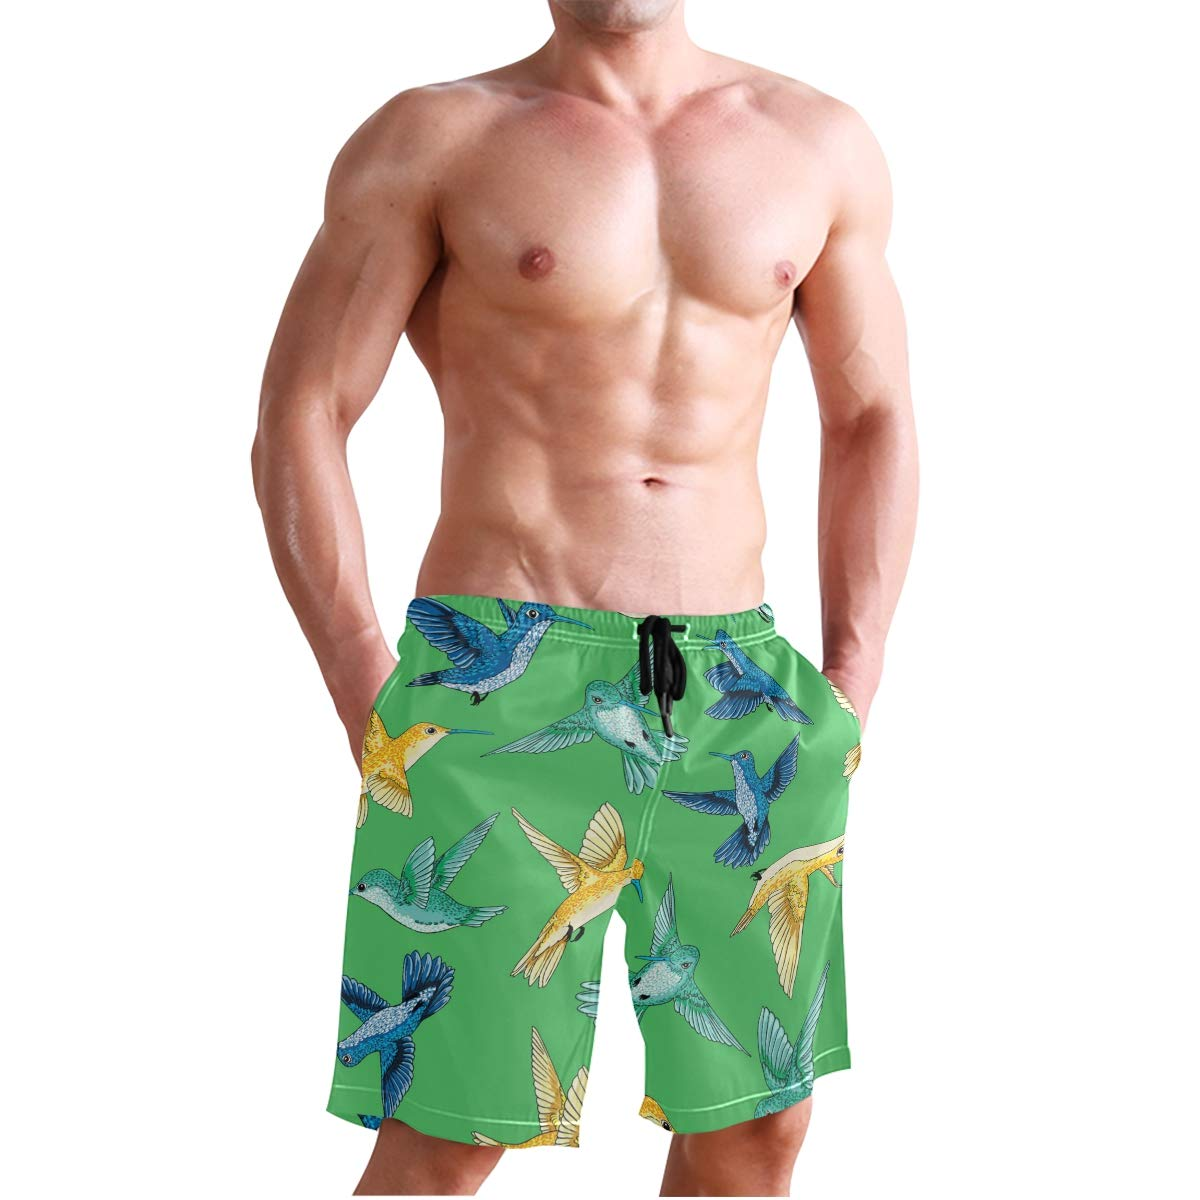 Mens Beach Swim Trunks Birds Pattern Boxer Swimsuit Underwear Board Shorts with Pocket